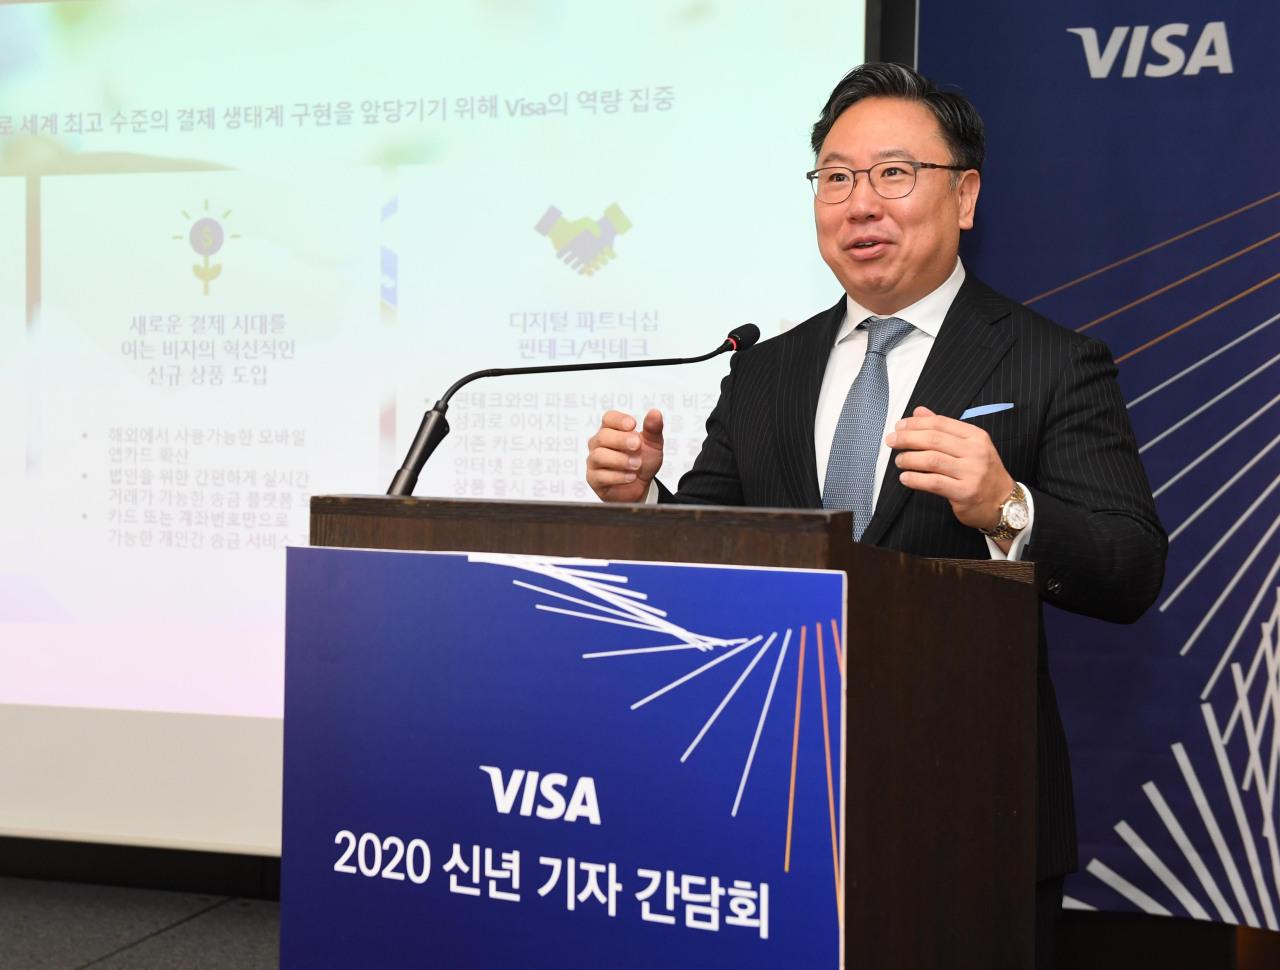 Visa Korea CEO Patrick Yoon speaks at a media event in Seoul on Monday. (Visa Korea)